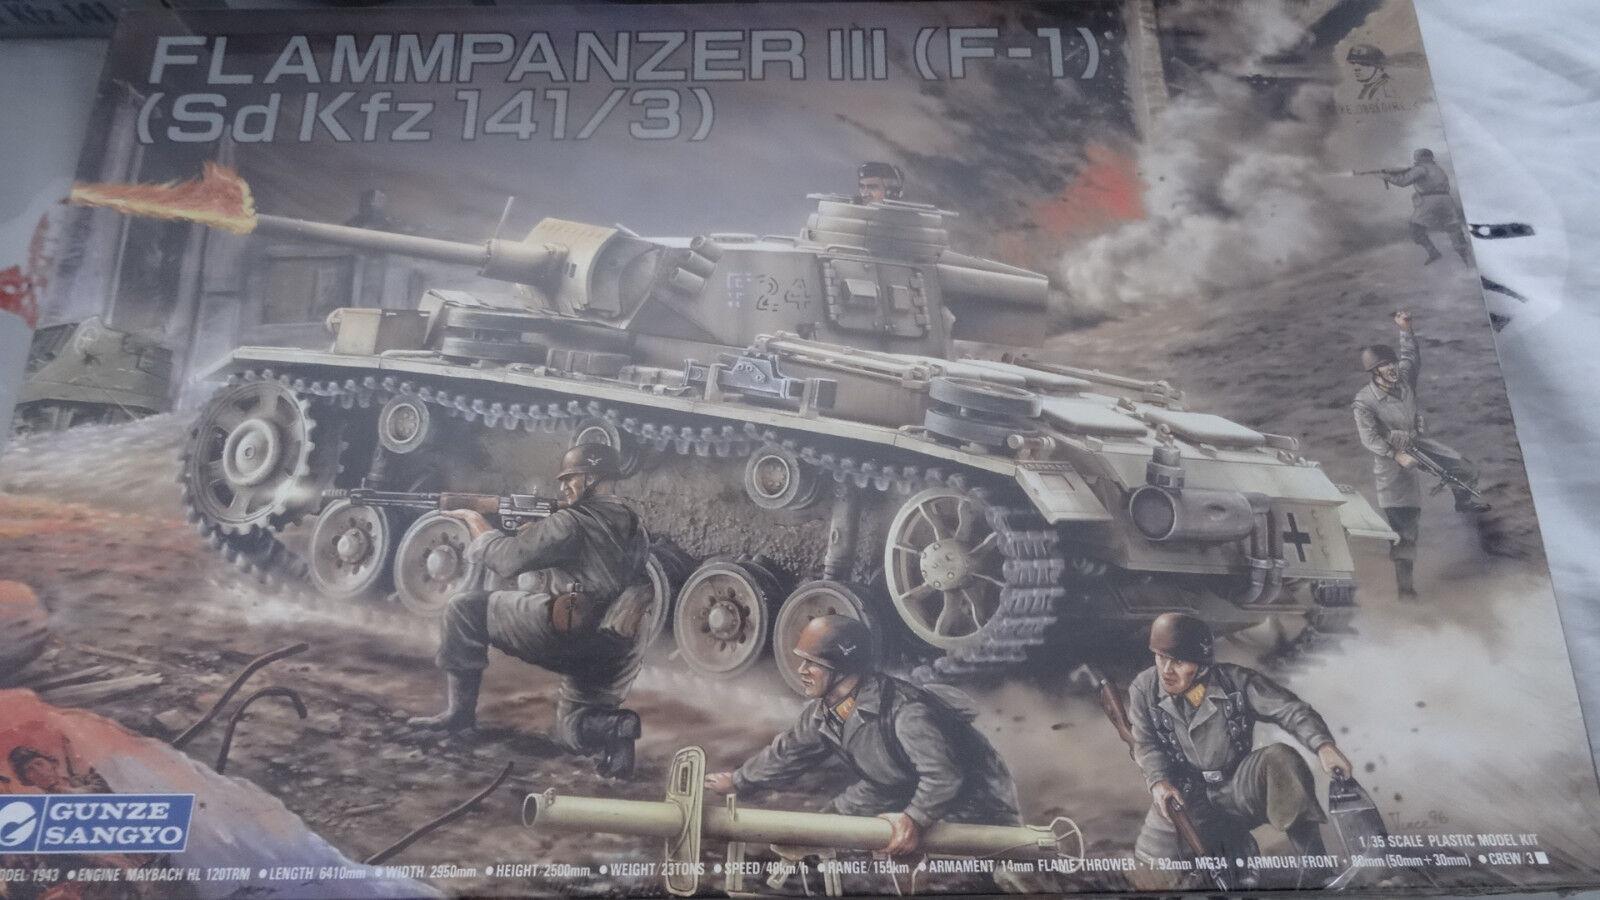 barato y de alta calidad Maquette Neuve GUNZE SANGYO 1 35 Char FLAMMPANZER III (F1) (F1) (F1) ( Sd Kfz 141 3 )  barato en línea